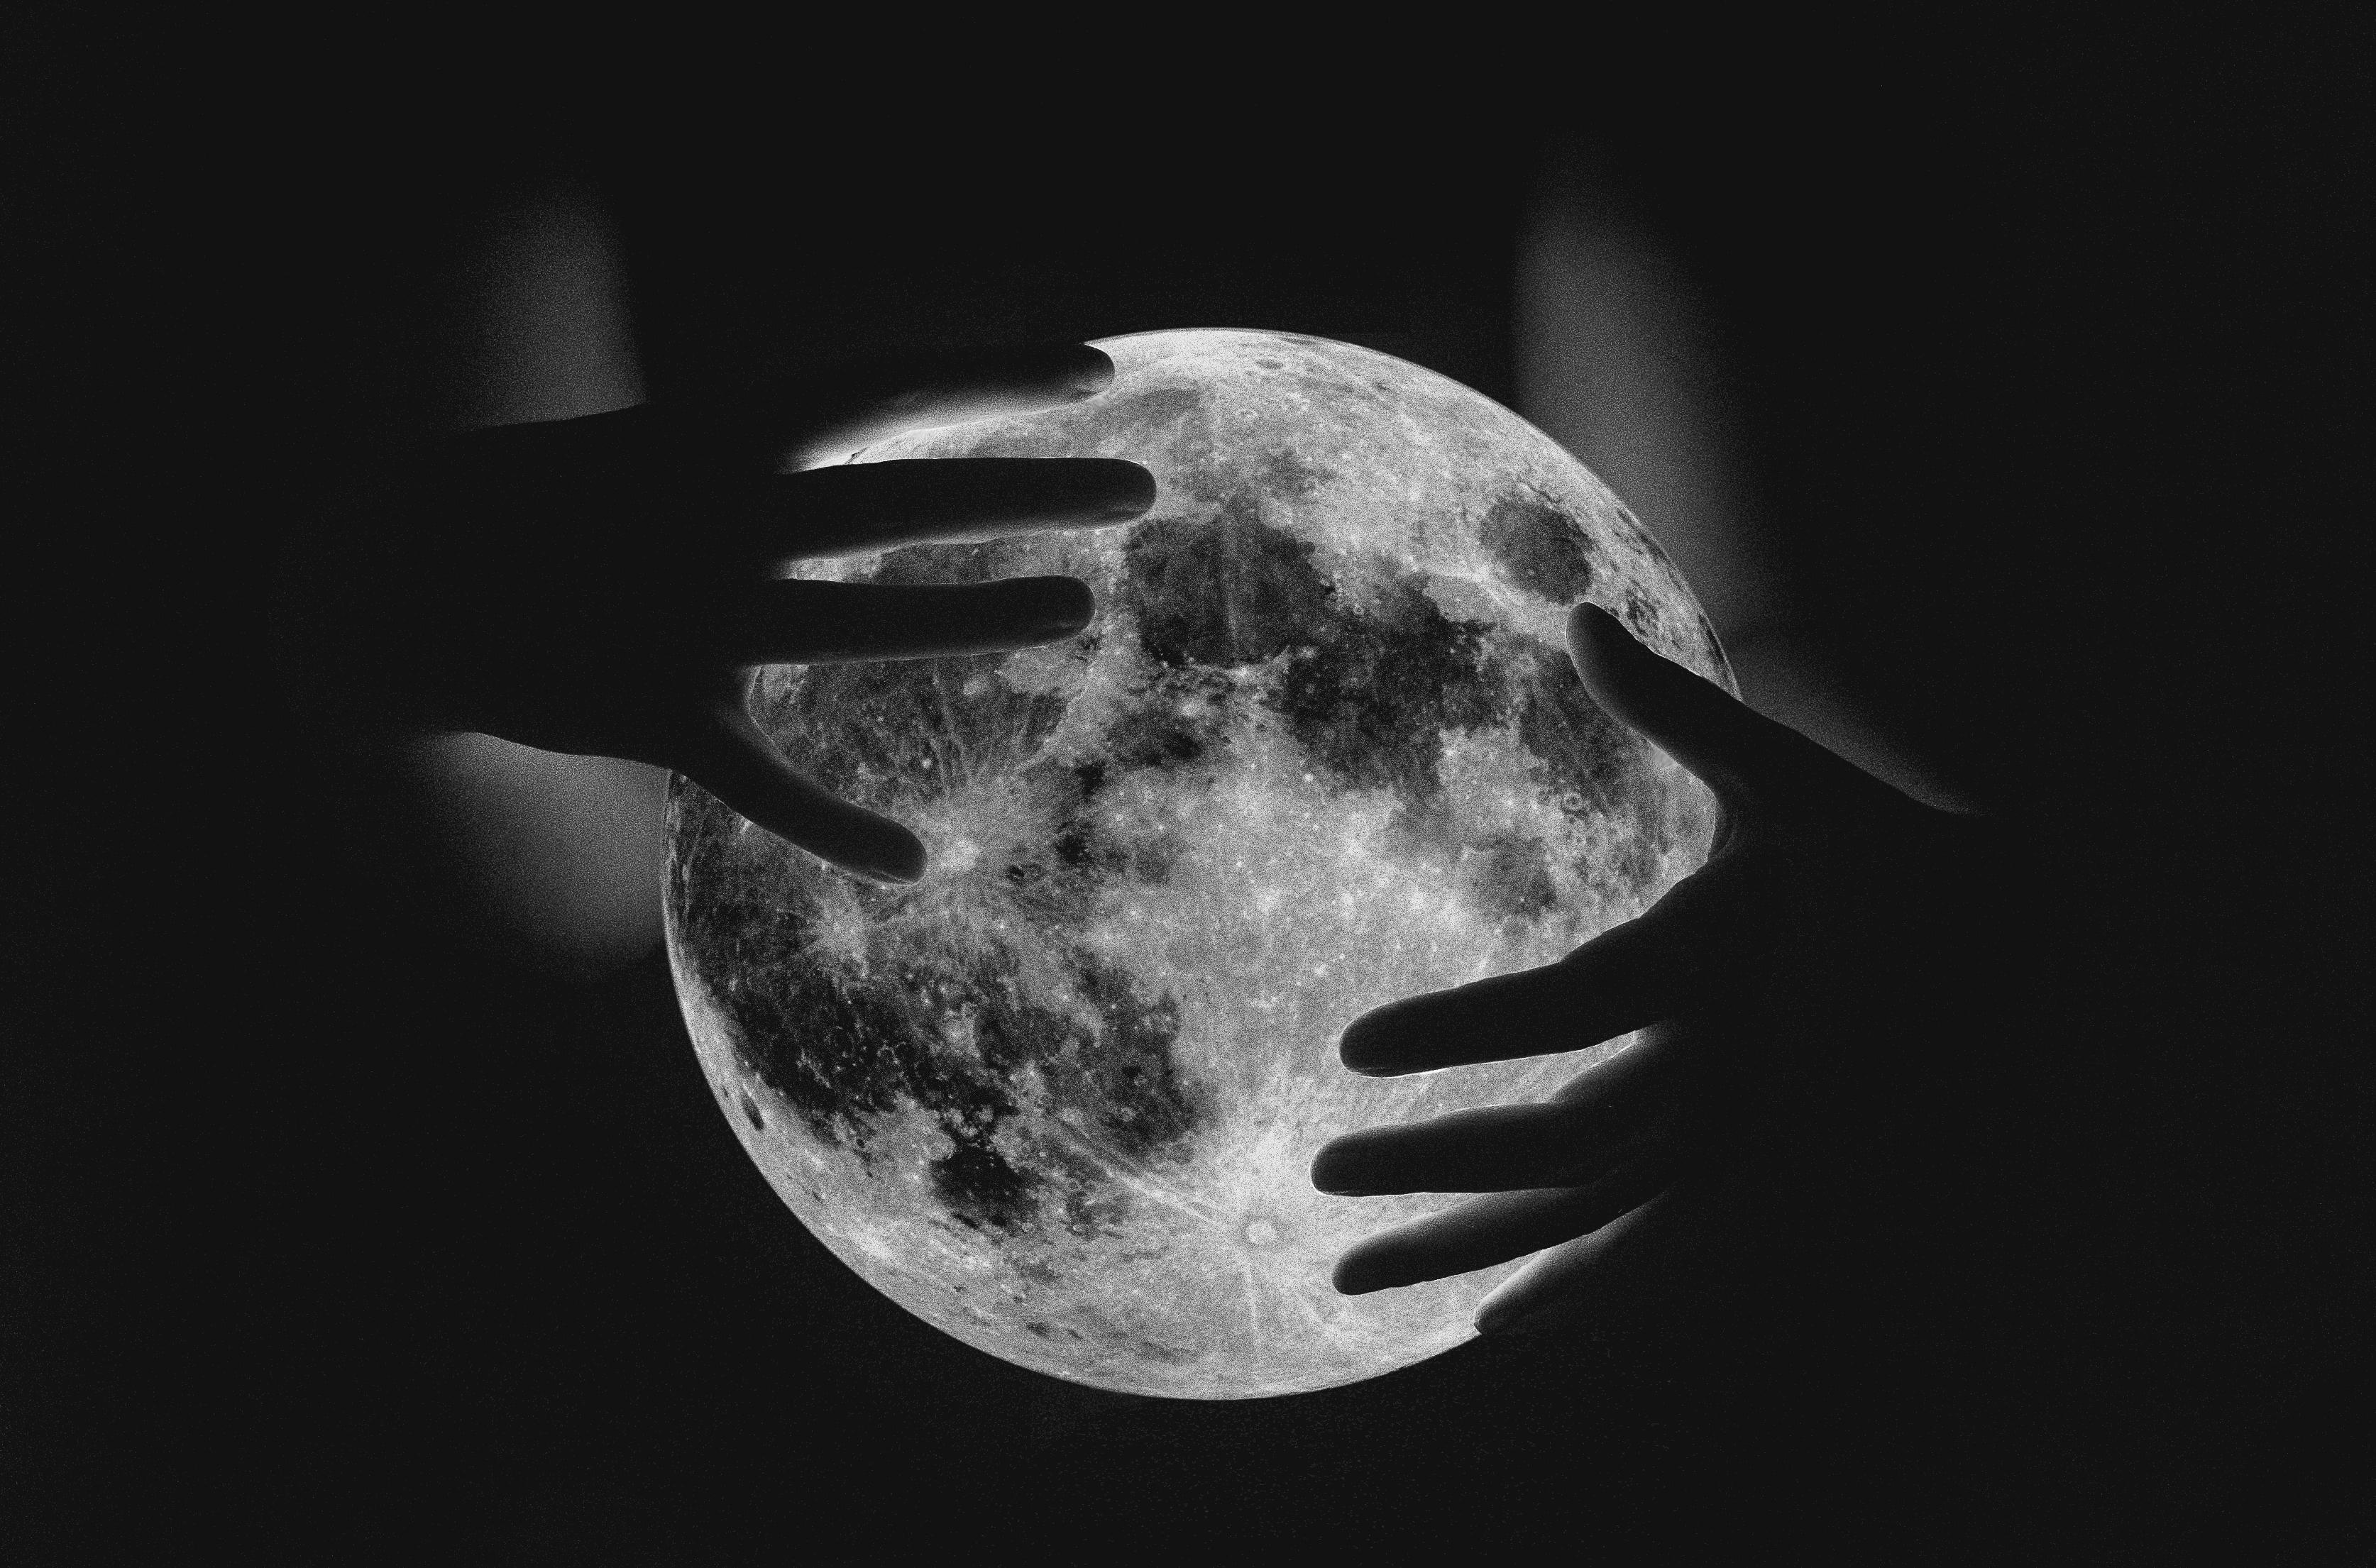 темная луна ава картинки одном